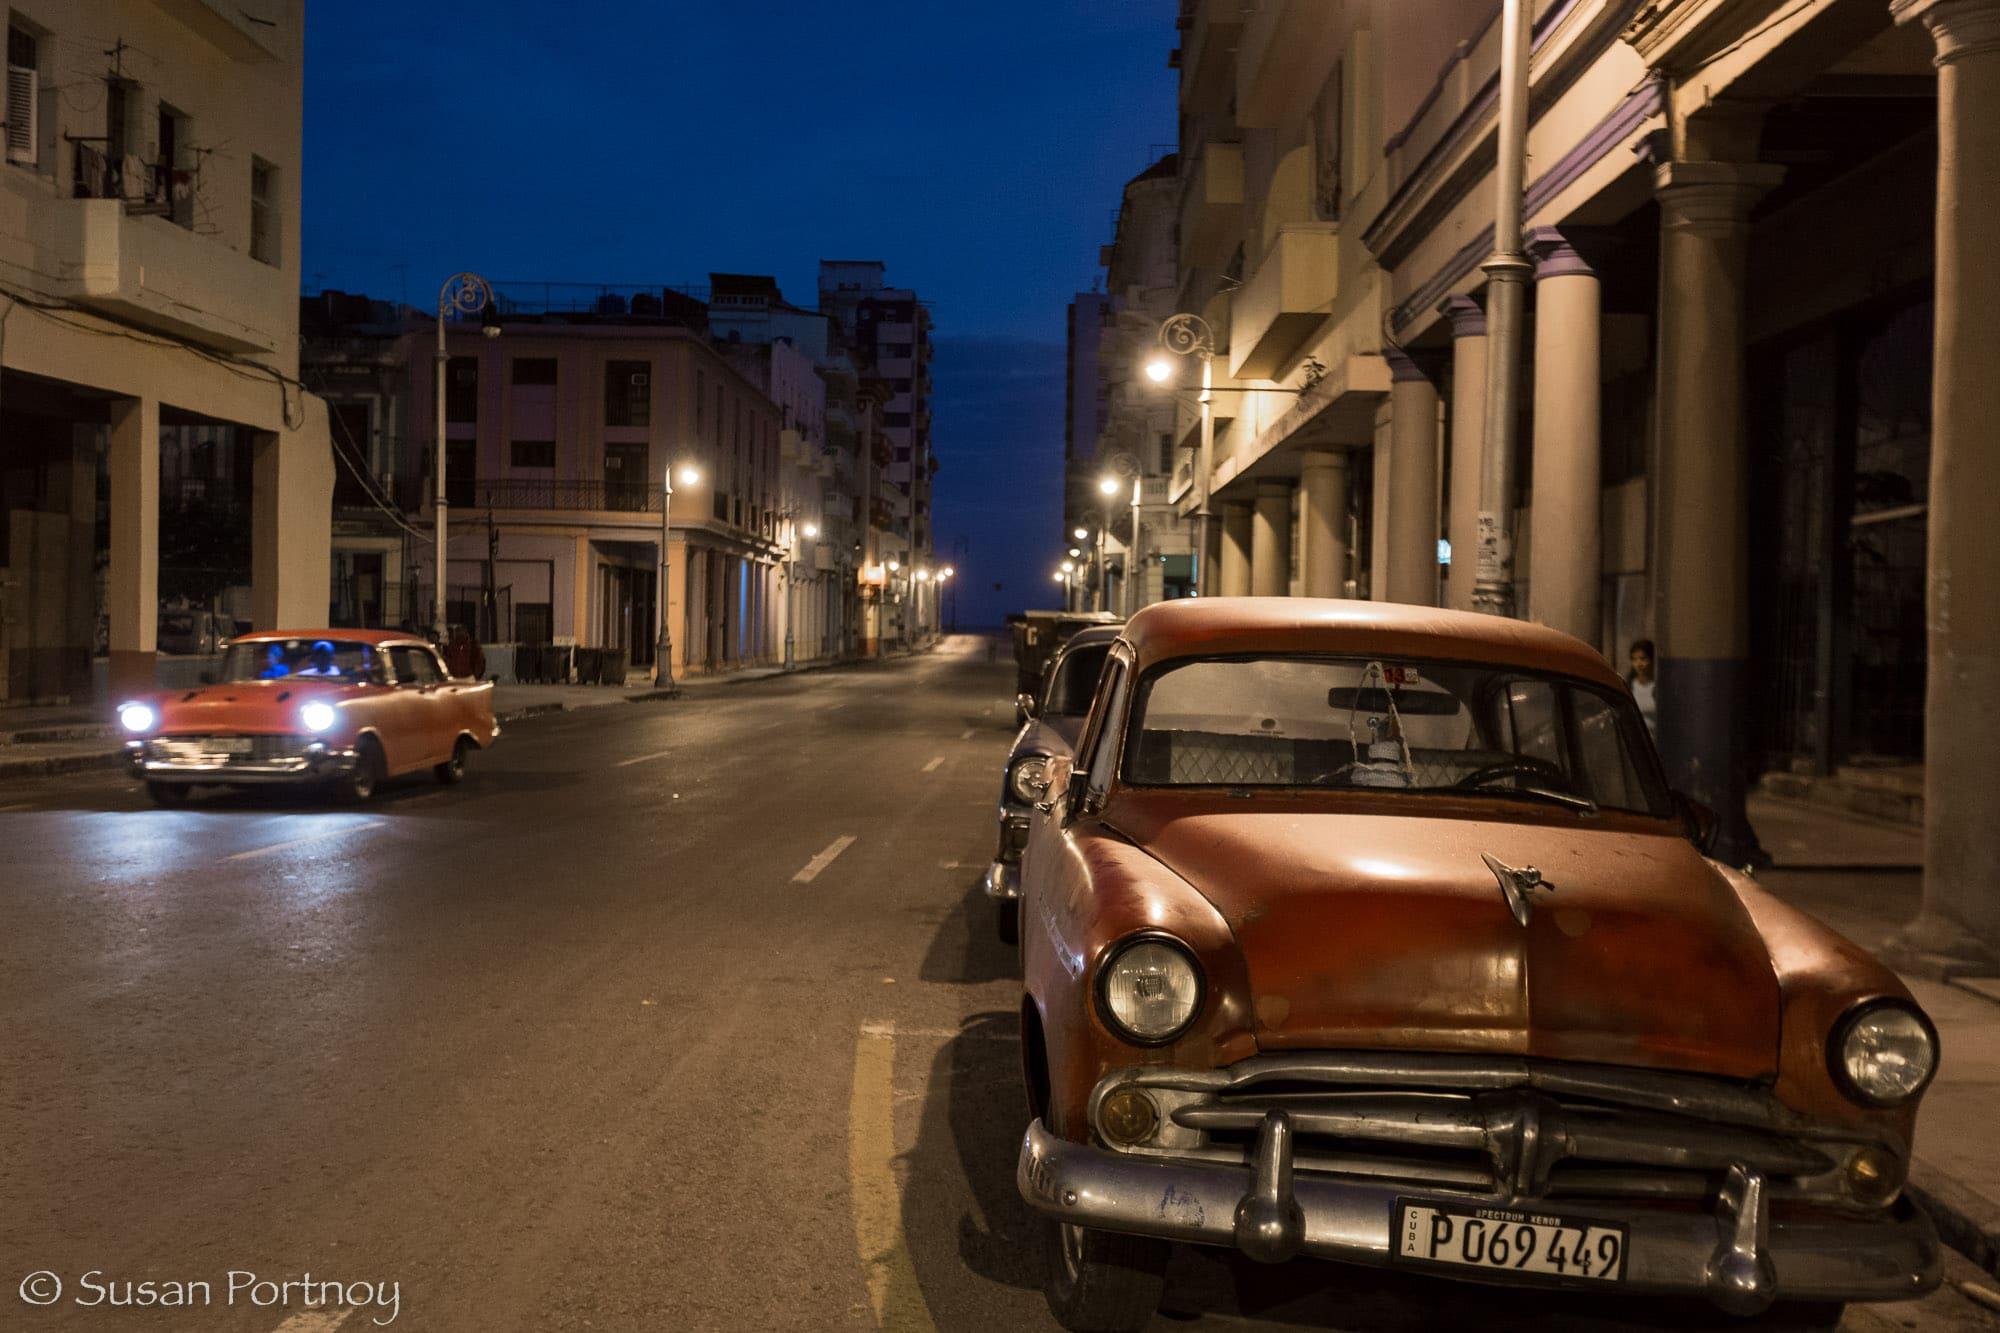 Early morning shot of red classic car in Havana. Cuba